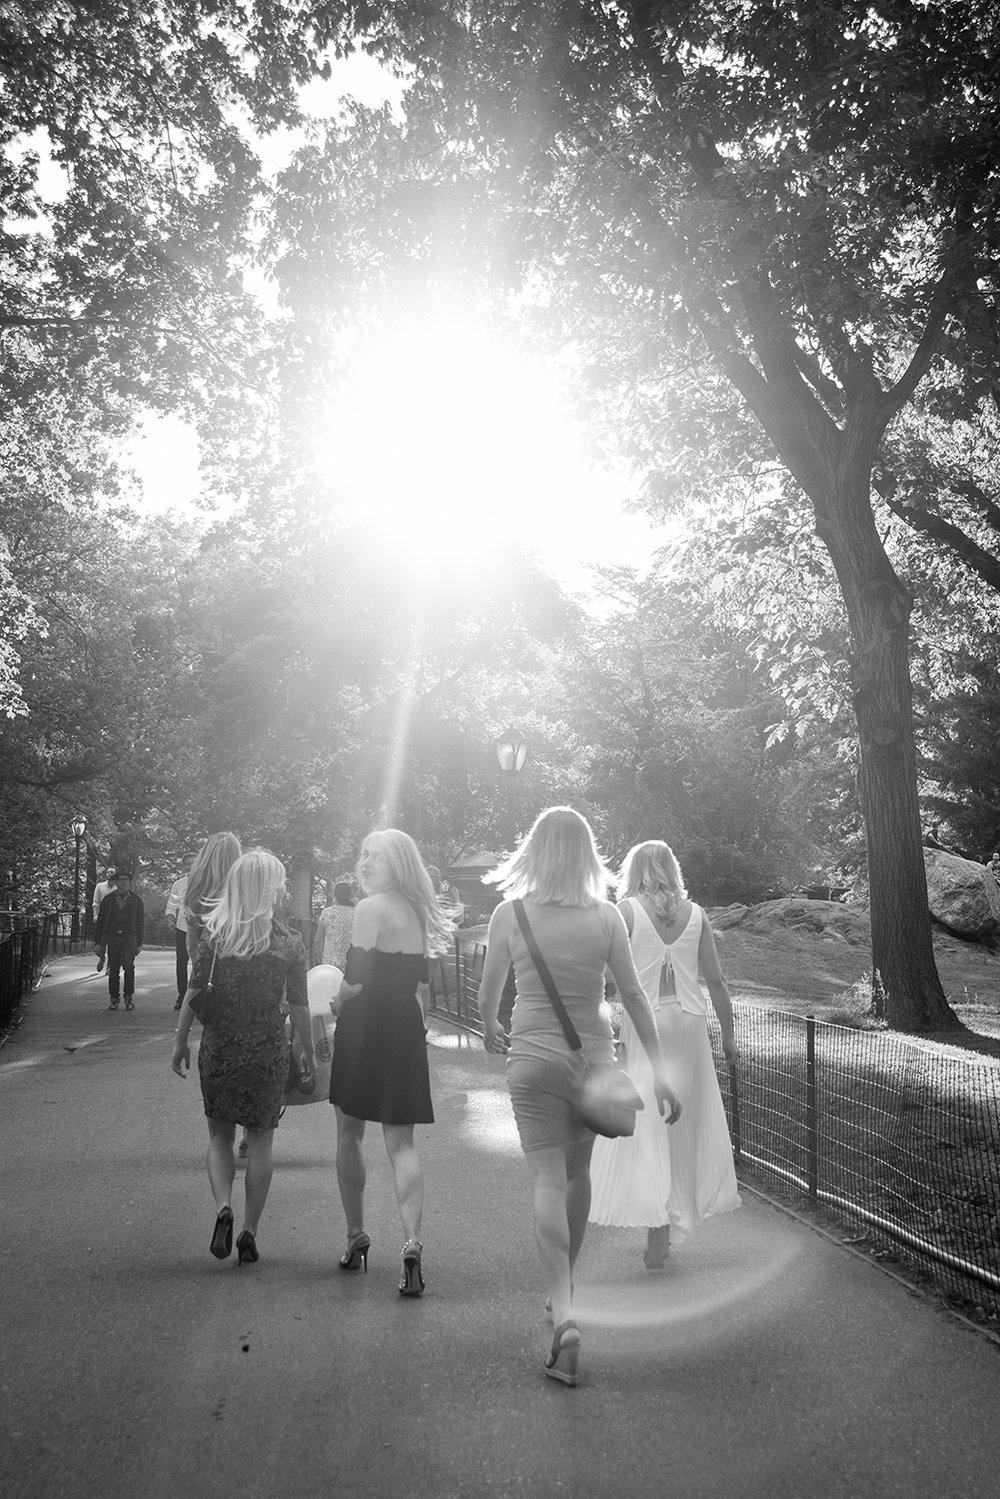 Bachelorette Party Photoshoot-Central Park-New York City- Olivia Christina Photo-129 copy.jpg